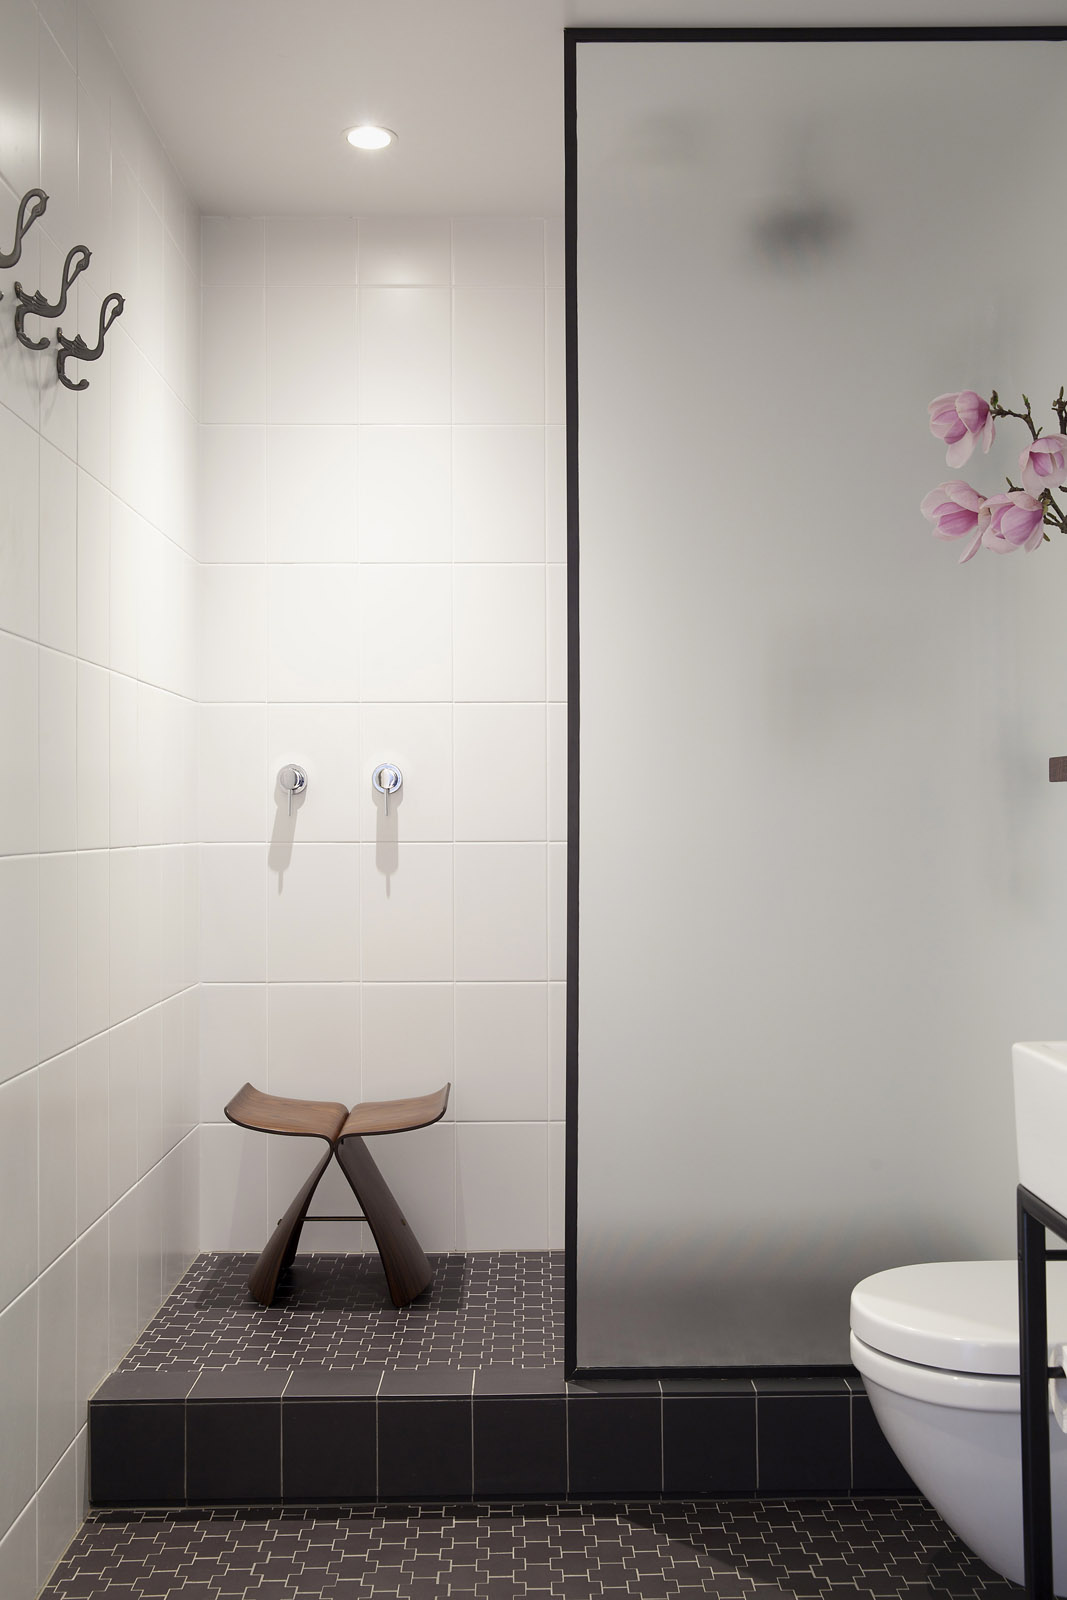 Bathroom Renovations Auckland - Bathroom renovation auckland